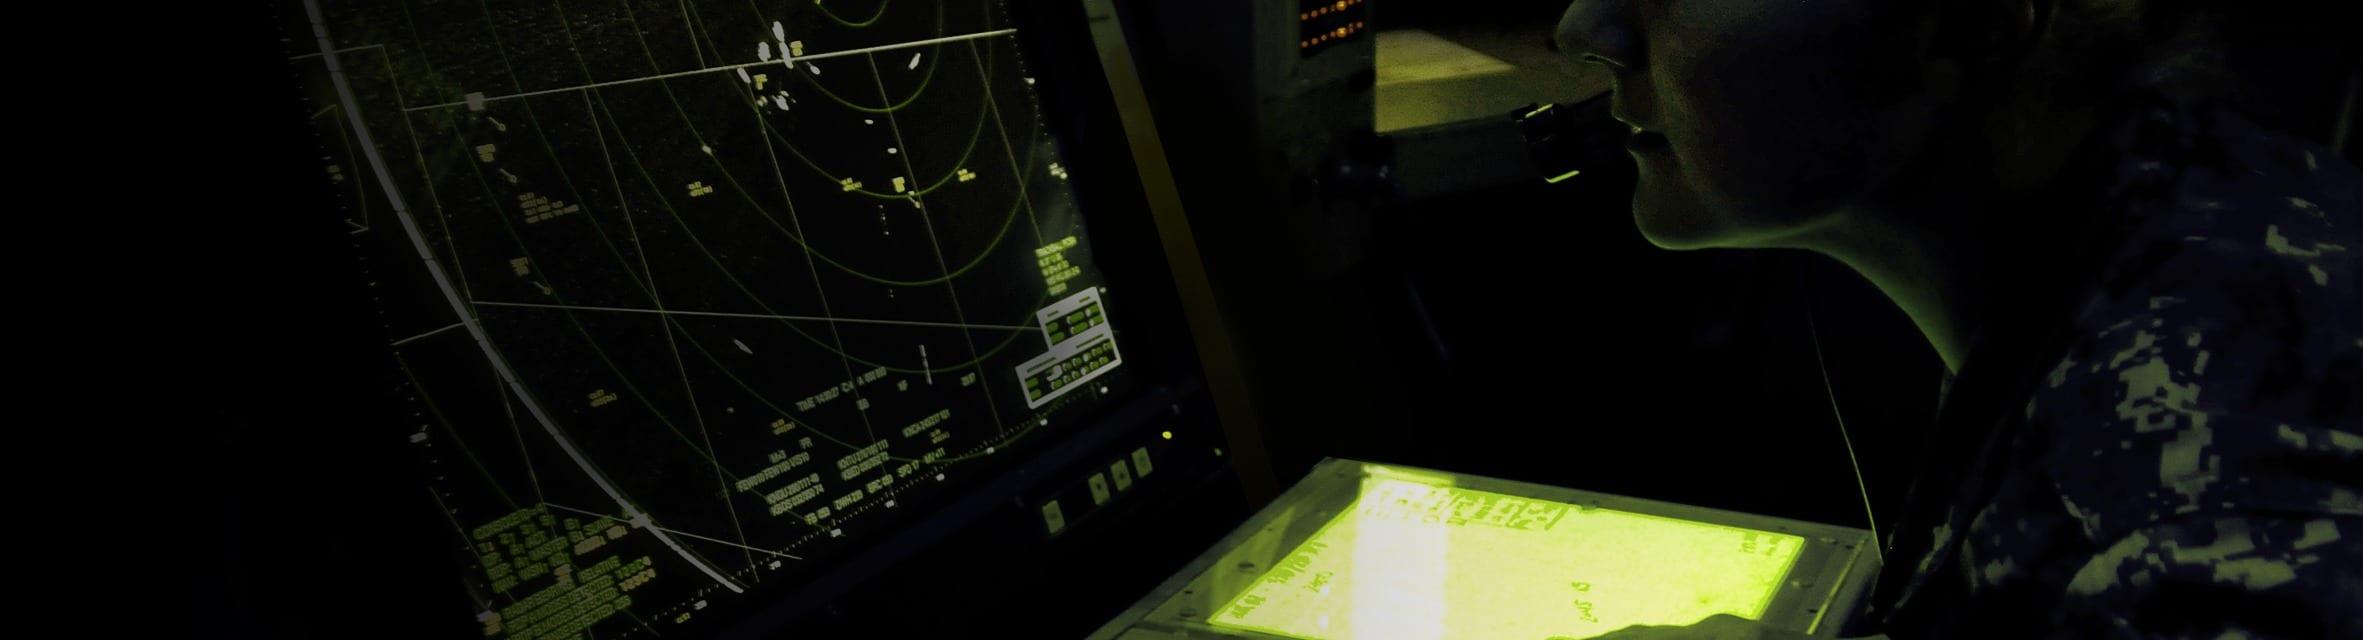 Military EMC Testing Capabilities